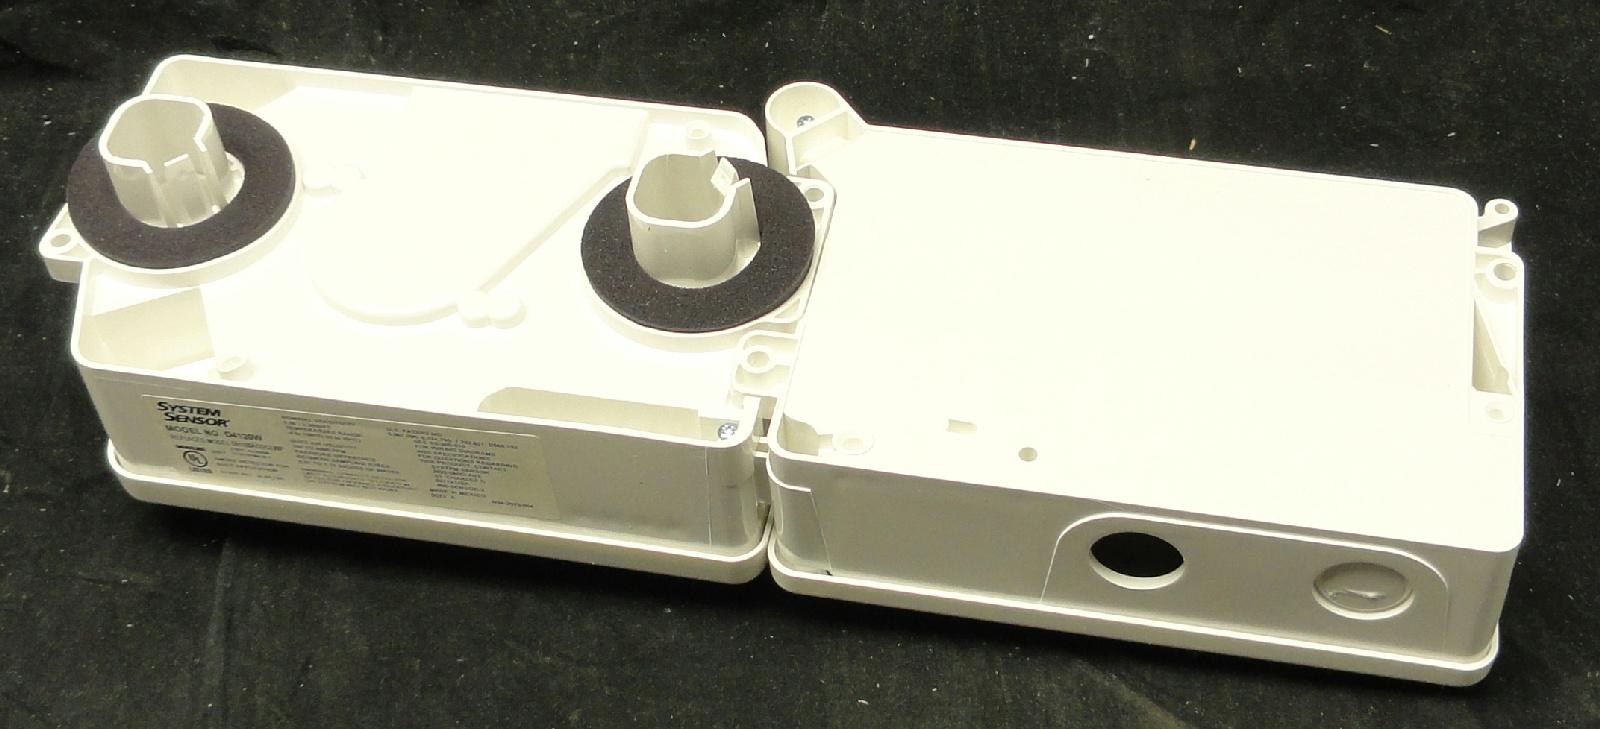 Nuevo Sistema Sensor D4120w Innovair Flex Conducto